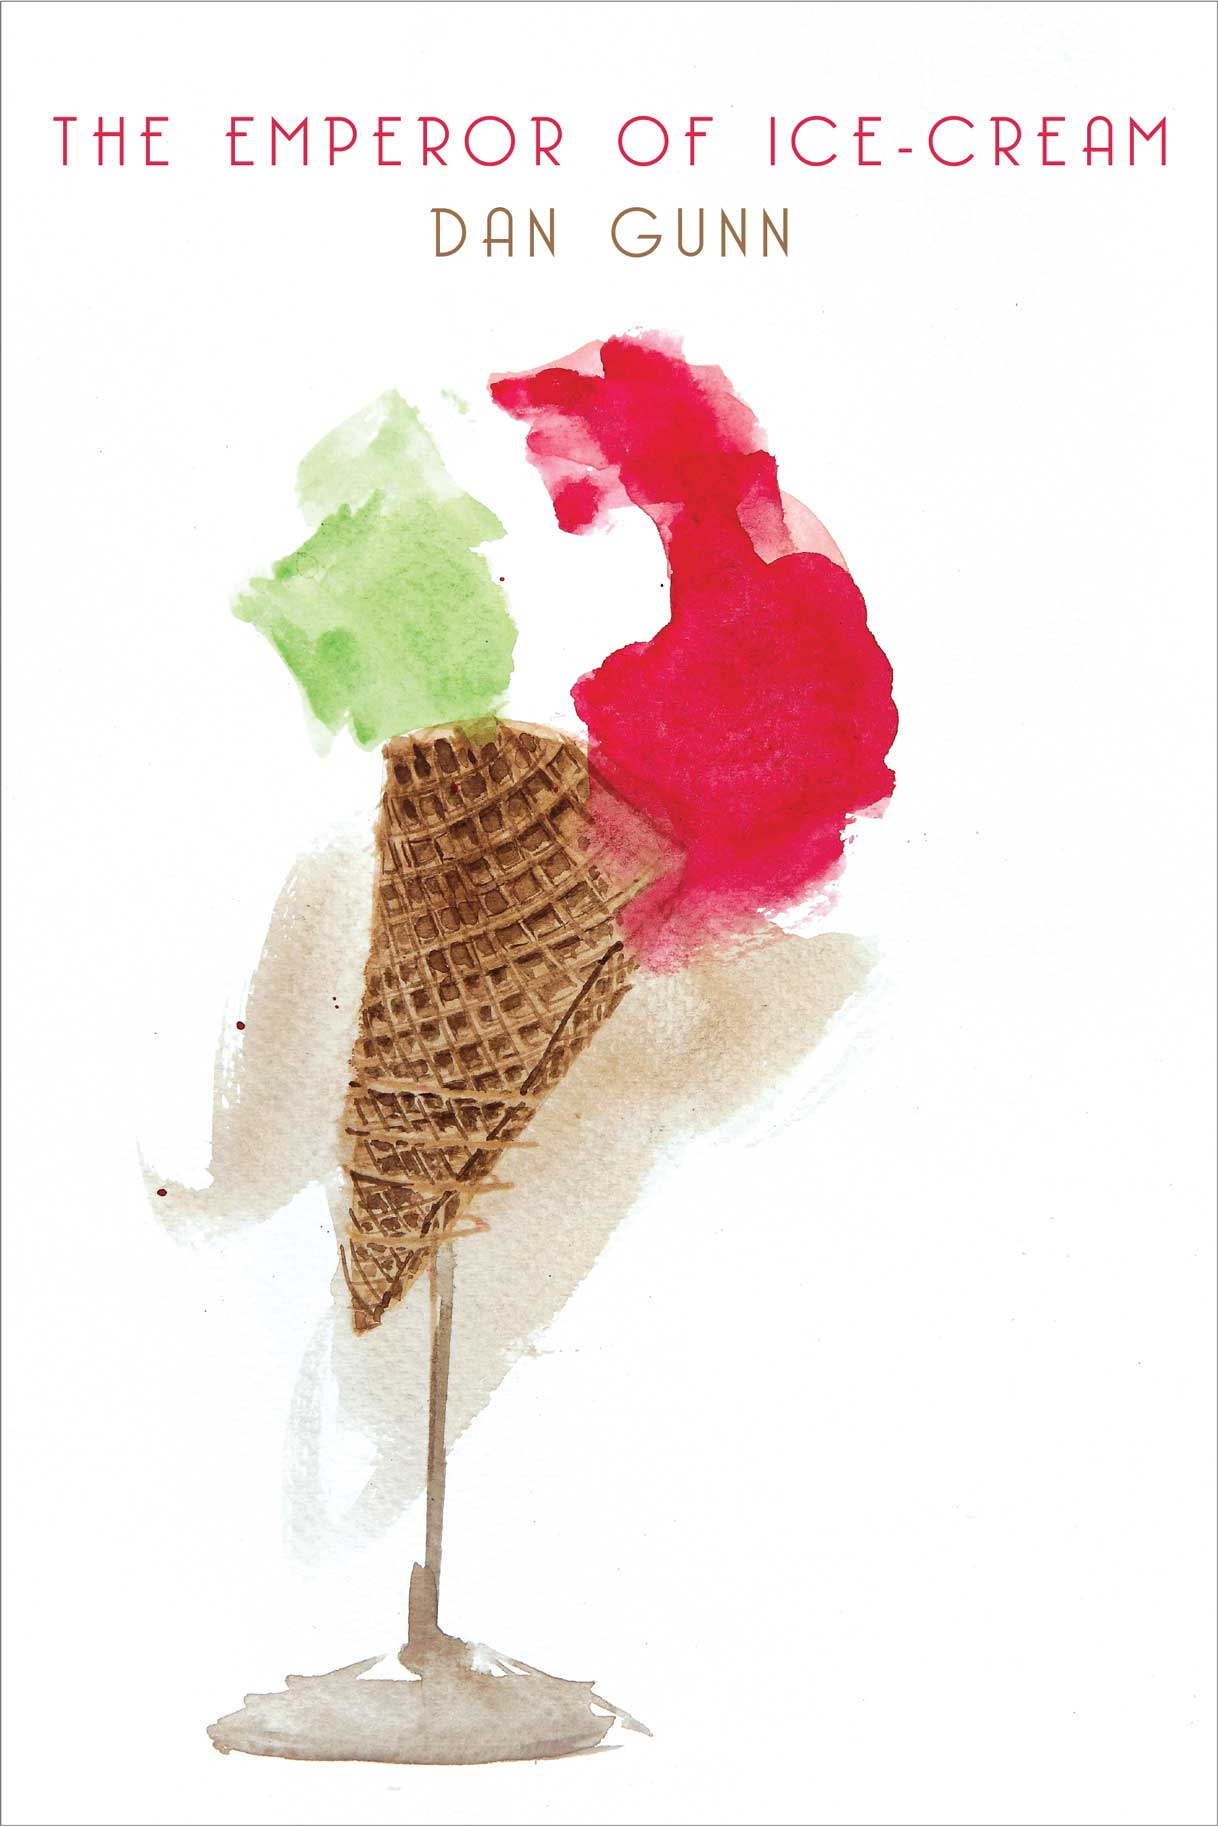 The Emperor of Ice-Cream by Dan Gunn   Seagull Books